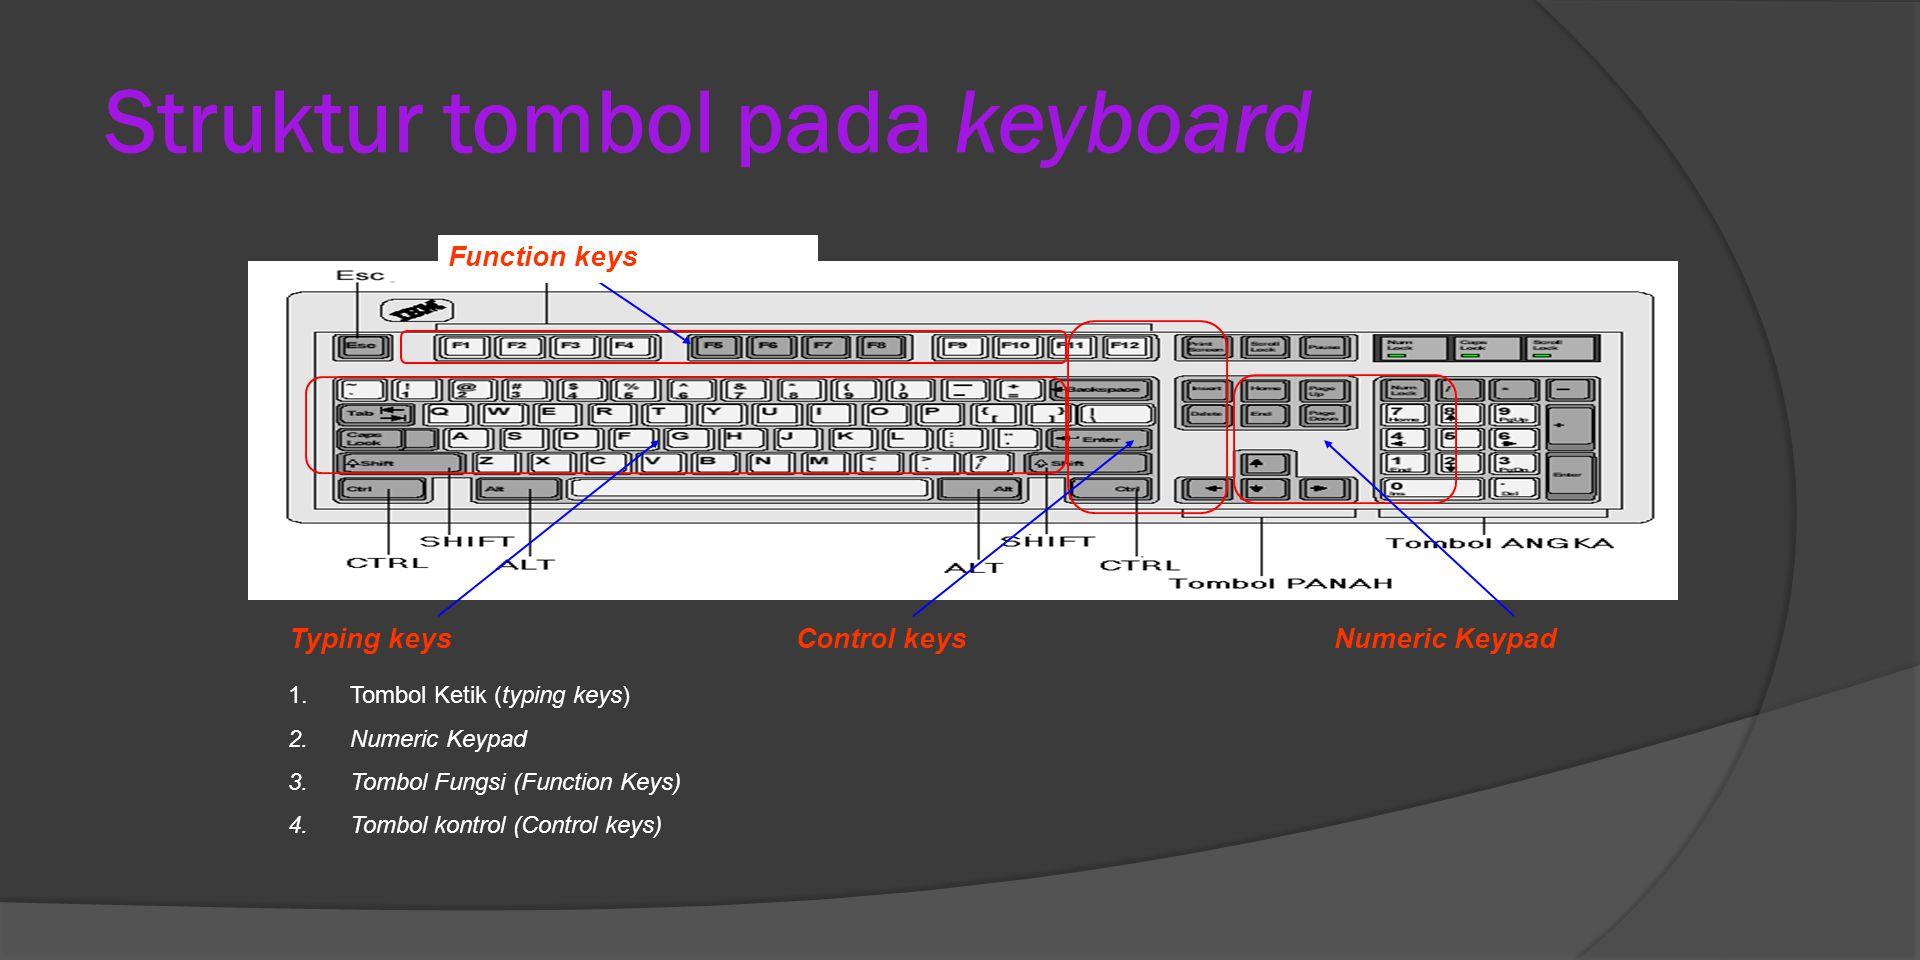 Struktur tombol pada keyboard Typing keysControl keysNumeric Keypad Function keys 1.Tombol Ketik (typing keys) 2.Numeric Keypad 3.Tombol Fungsi (Function Keys) 4.Tombol kontrol (Control keys)